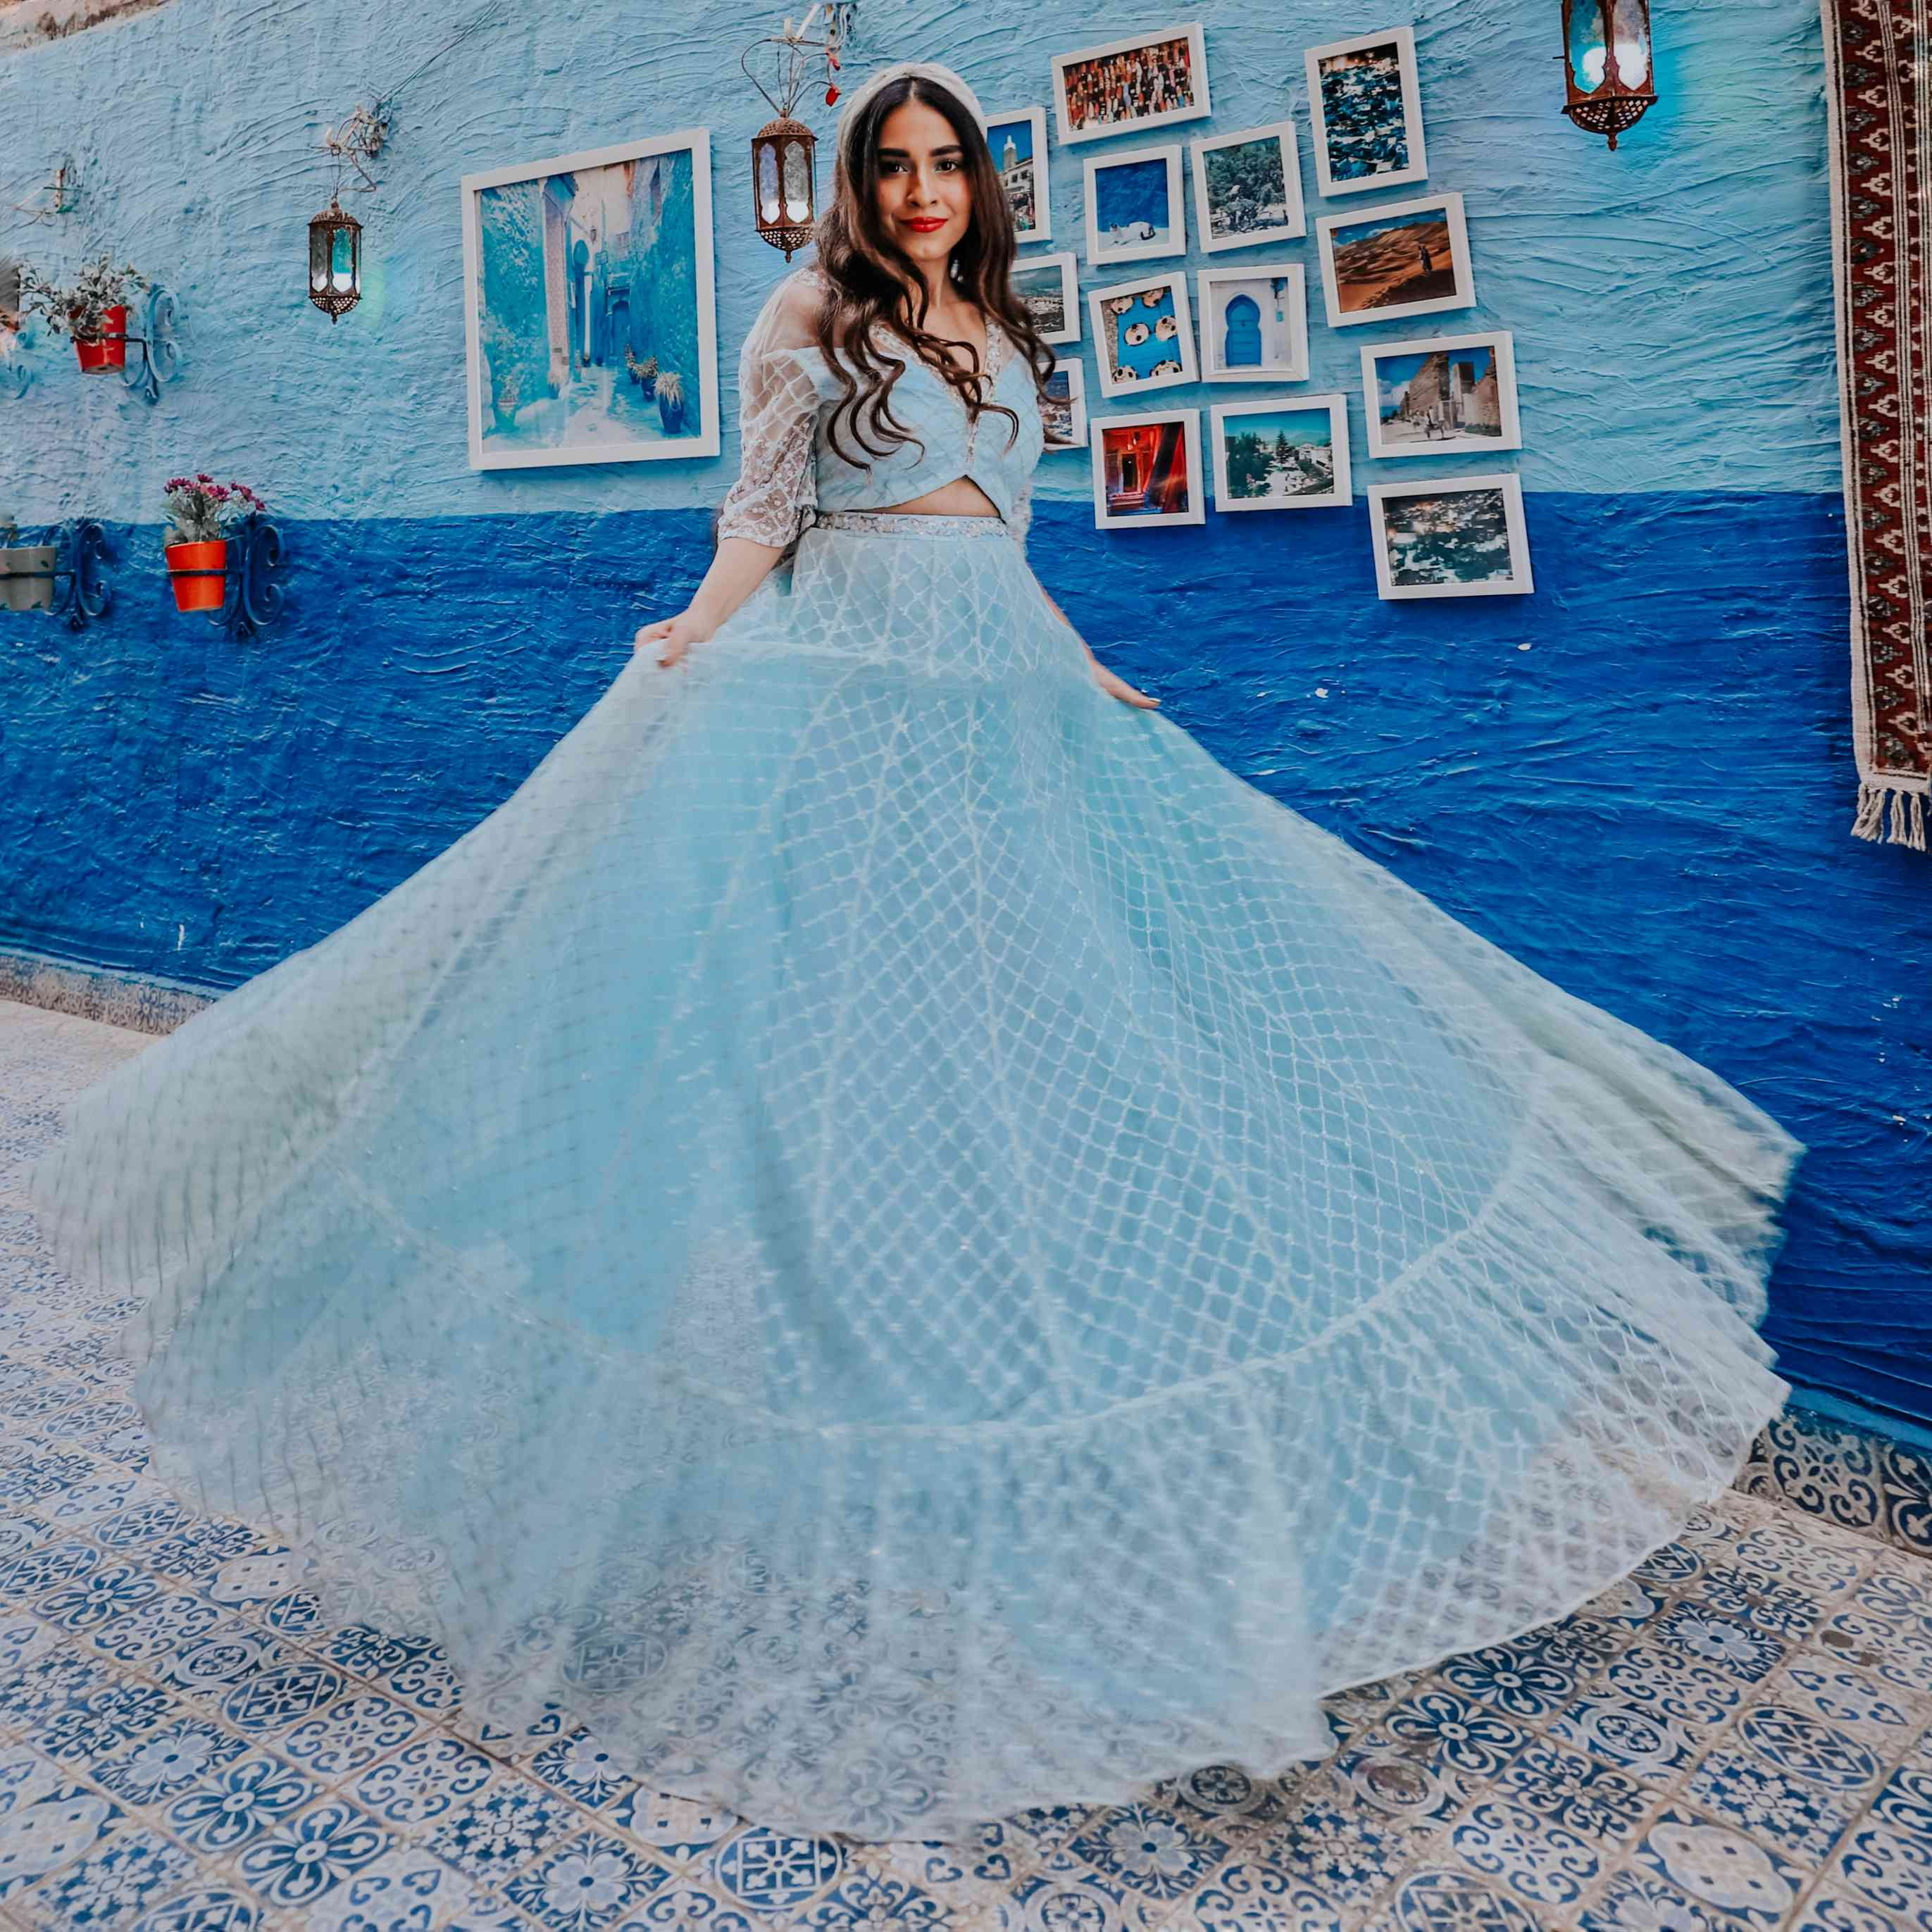 blue lehenga,princess outfit, princess lehenga, pernias pop up shop, Blue gown, wedding outfits, indian wedding outfit, indian wedding outfit ideas,bridesmaid outfit ideas, blue mermain gown, blue mermaid lehenga, shaadi outfits for bride, wedding outfit ideas, indian wedding guest outfit, idian wedding guest outfit ideas, indian wedding outfit under 50,000, indian wedding guest outfit budget, blue embroidered lehenga, indian traditional dress, blue net lehenga choli, buy lehenga online,